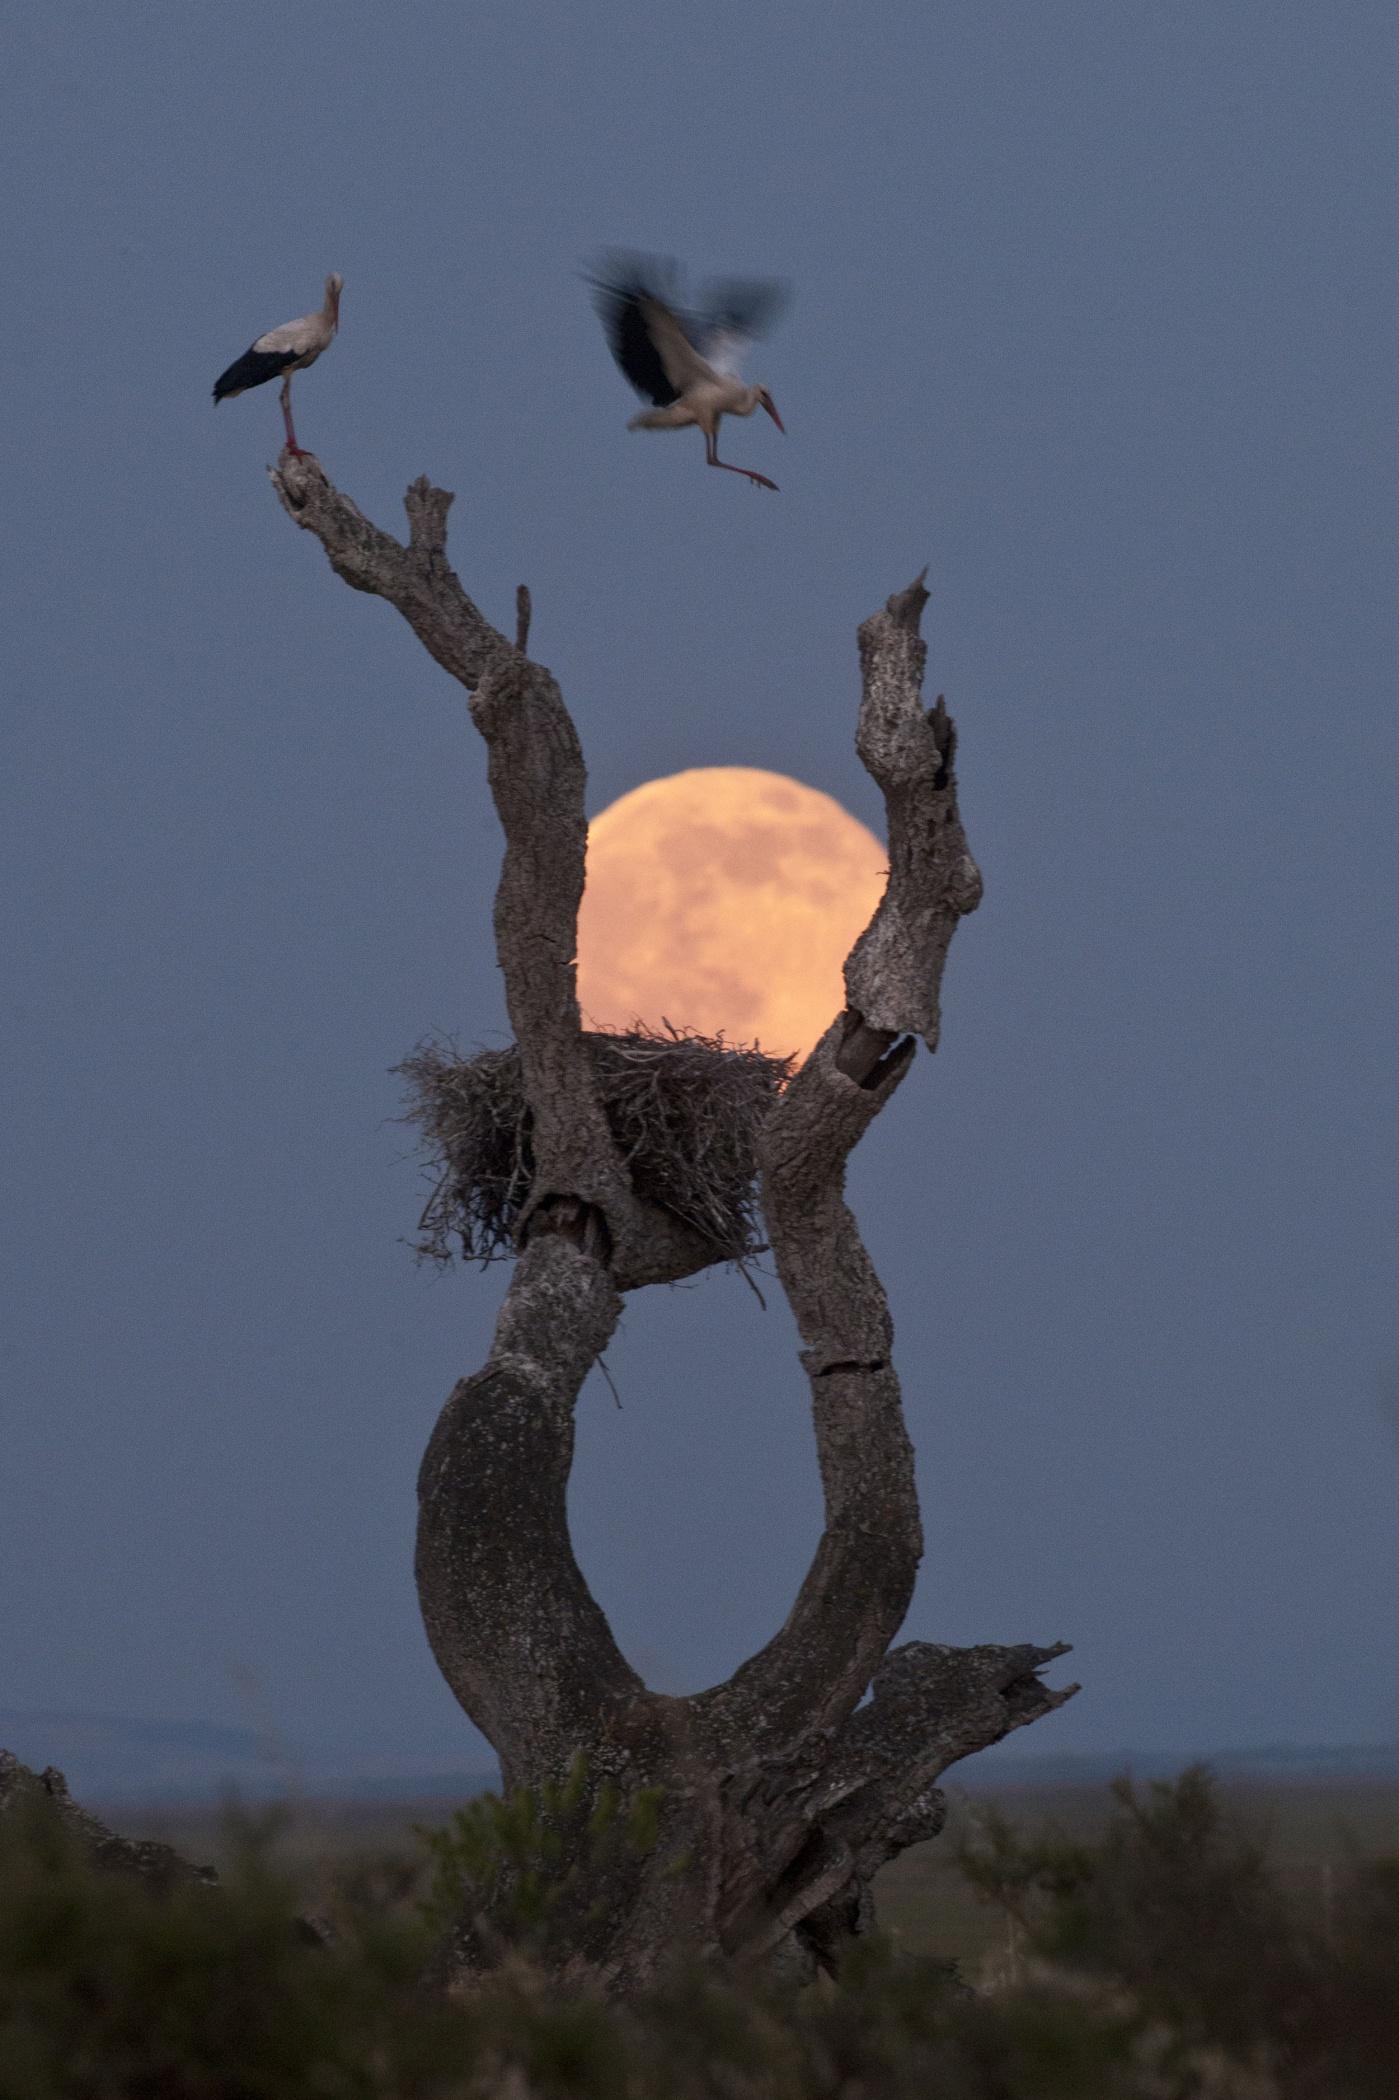 Incubar la luna - Prints 3. Gaia - Hector Garrido, Aerial and human photography